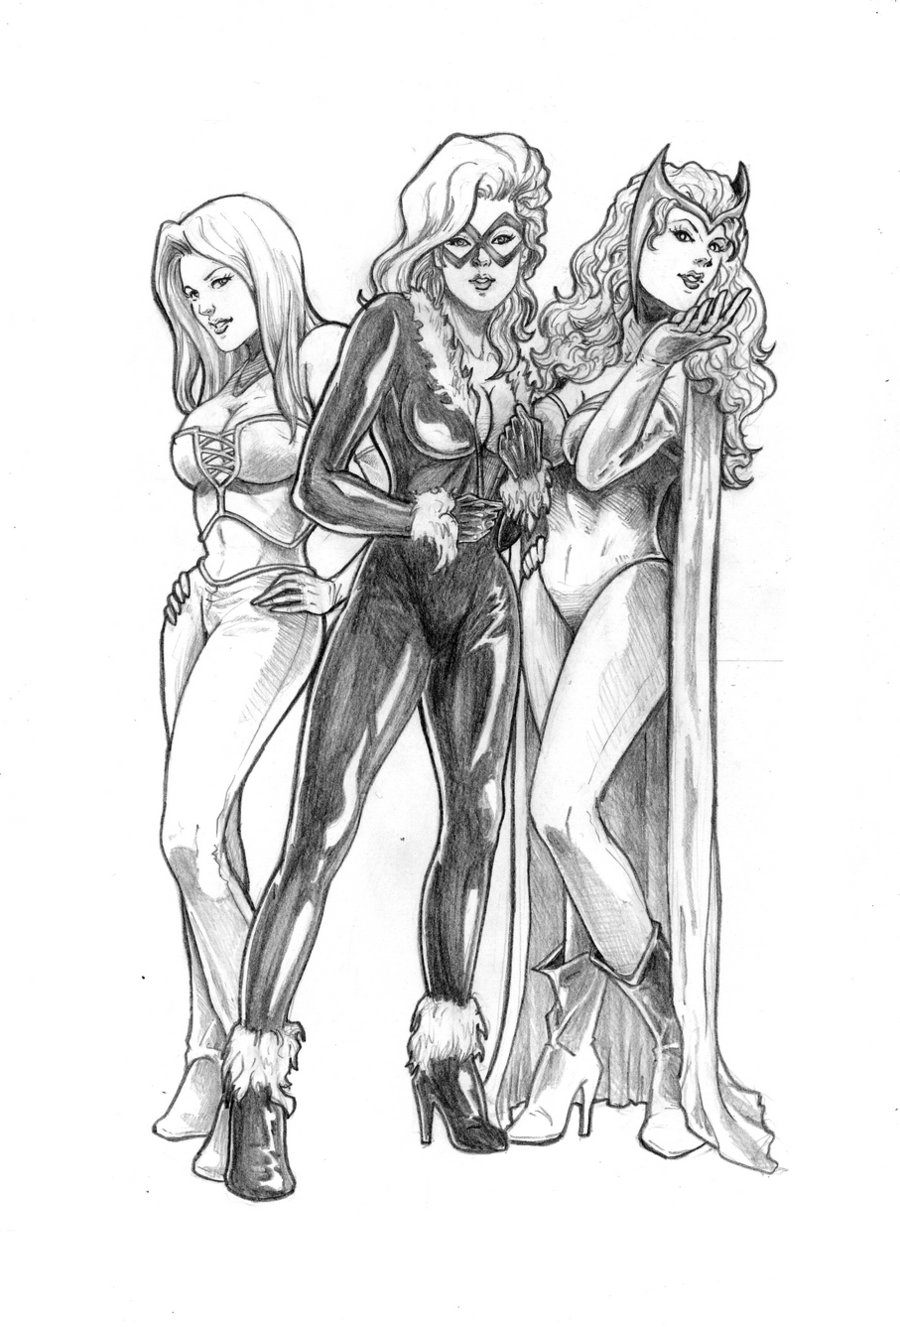 Drawn women marvel #1